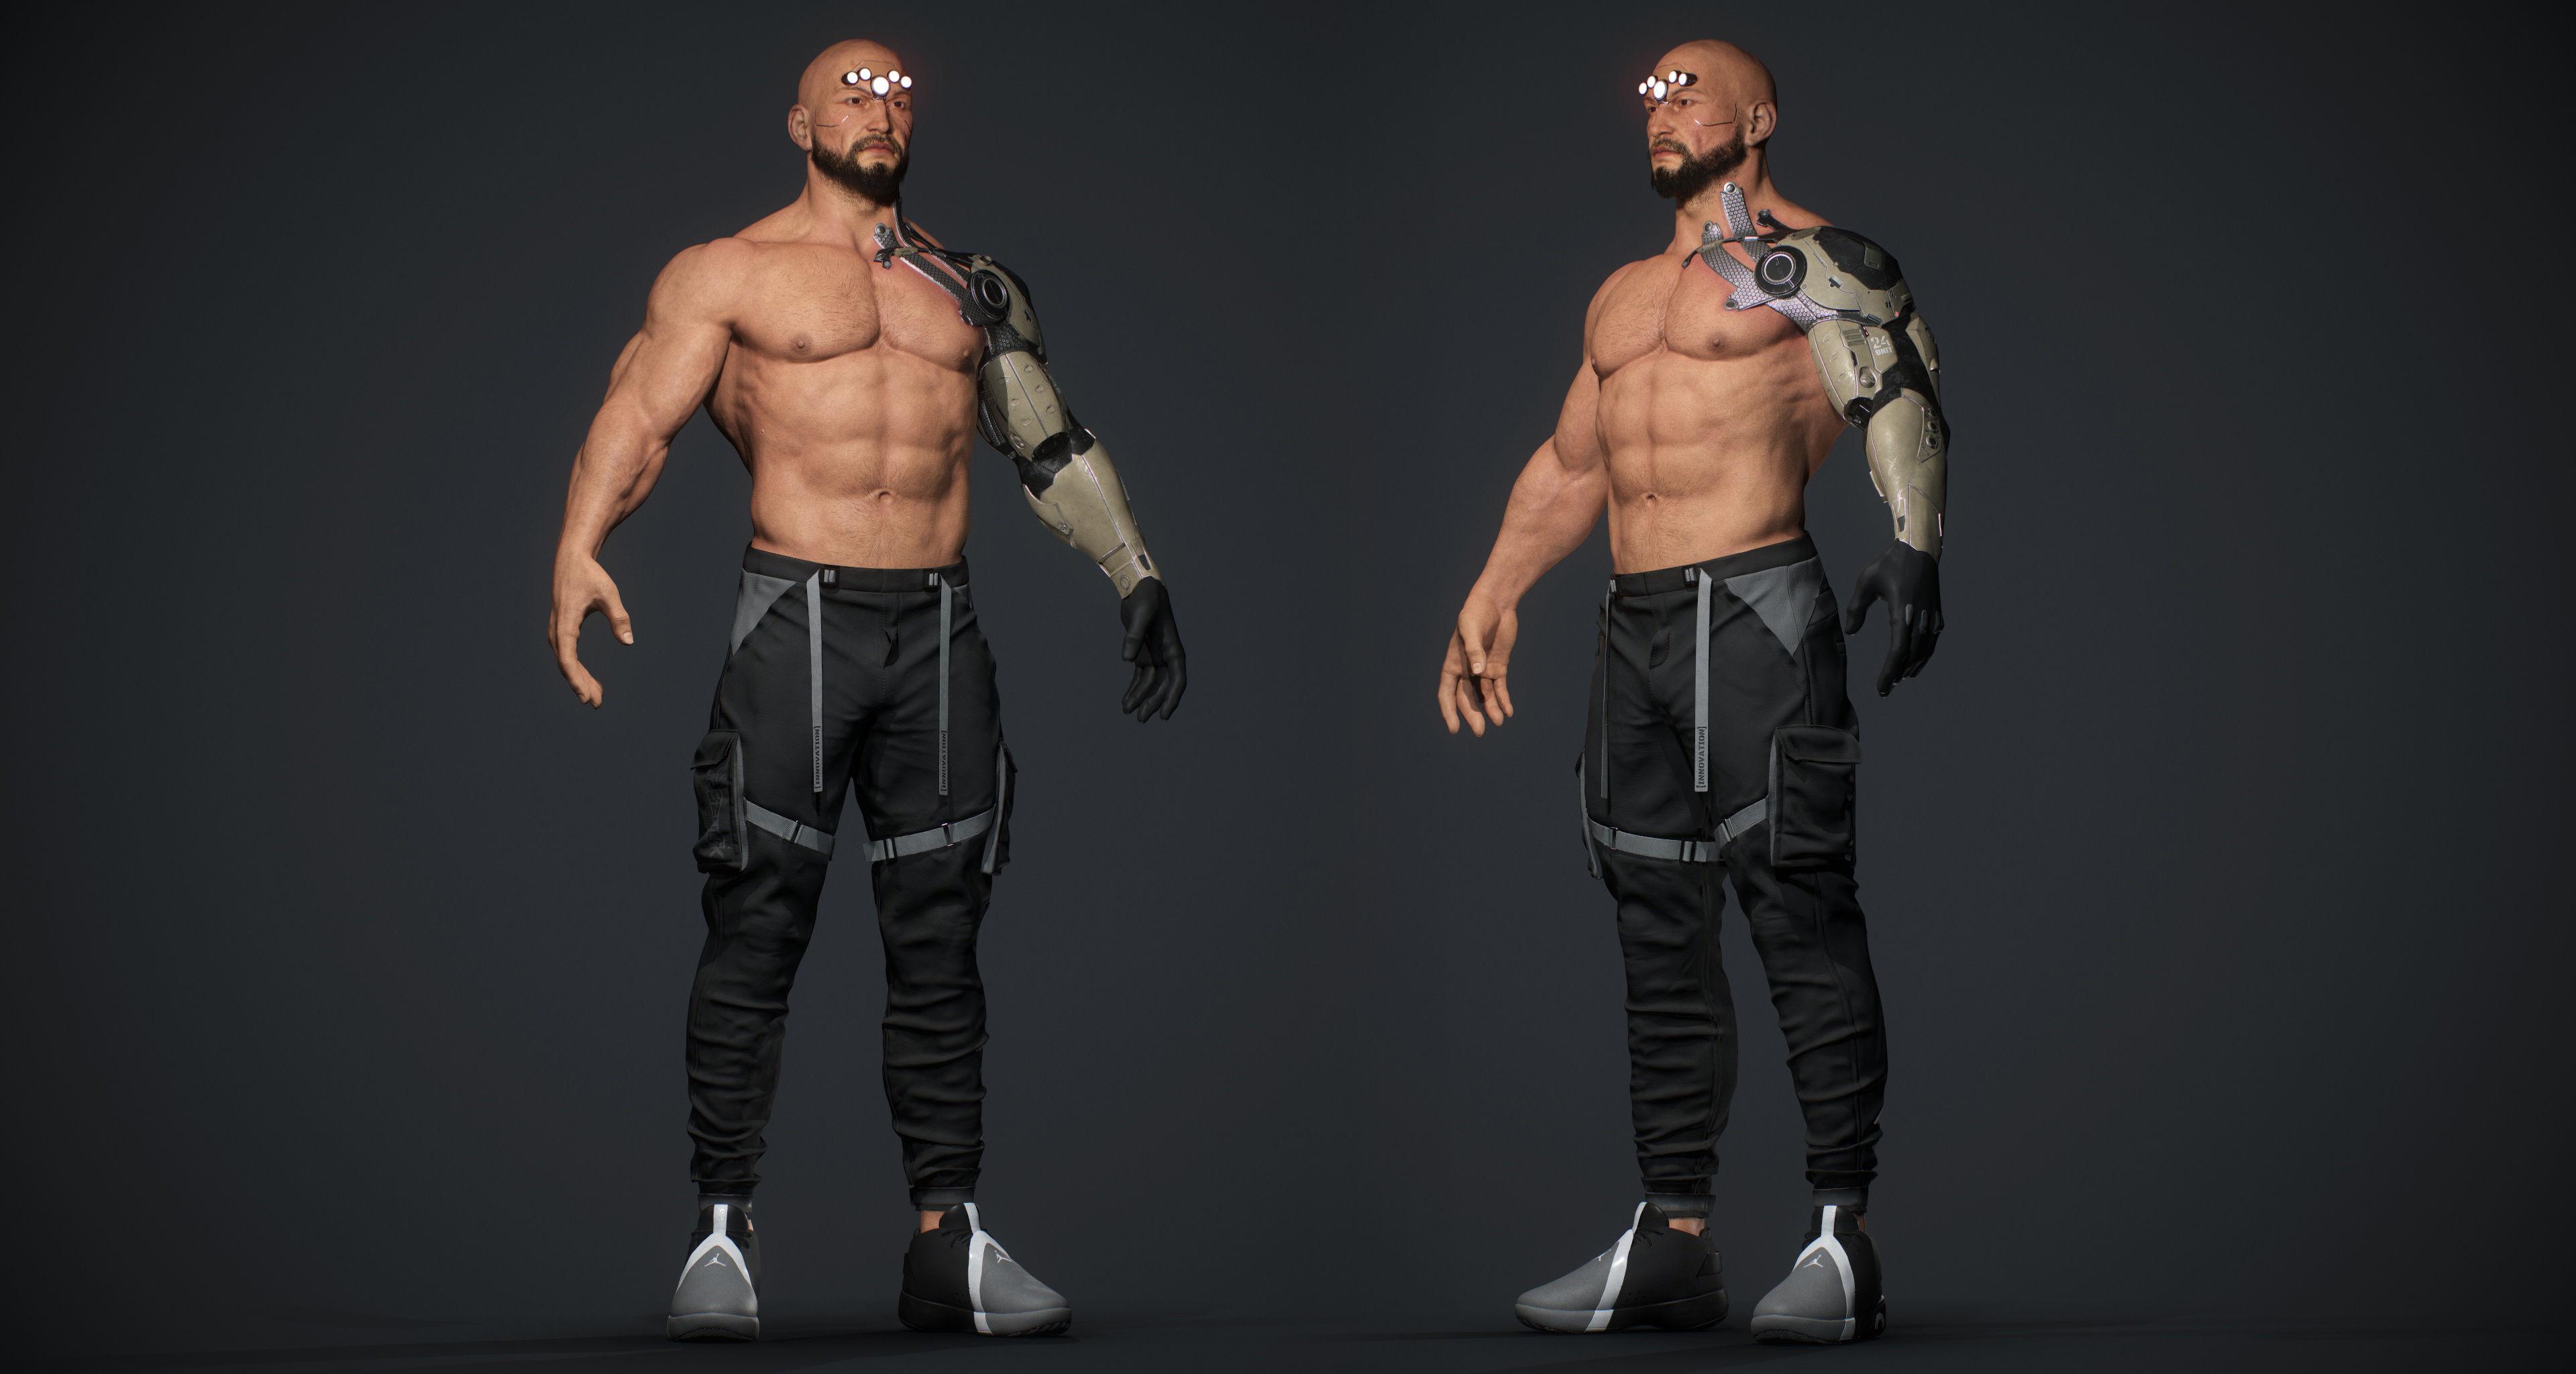 Cyberpunk Alexander